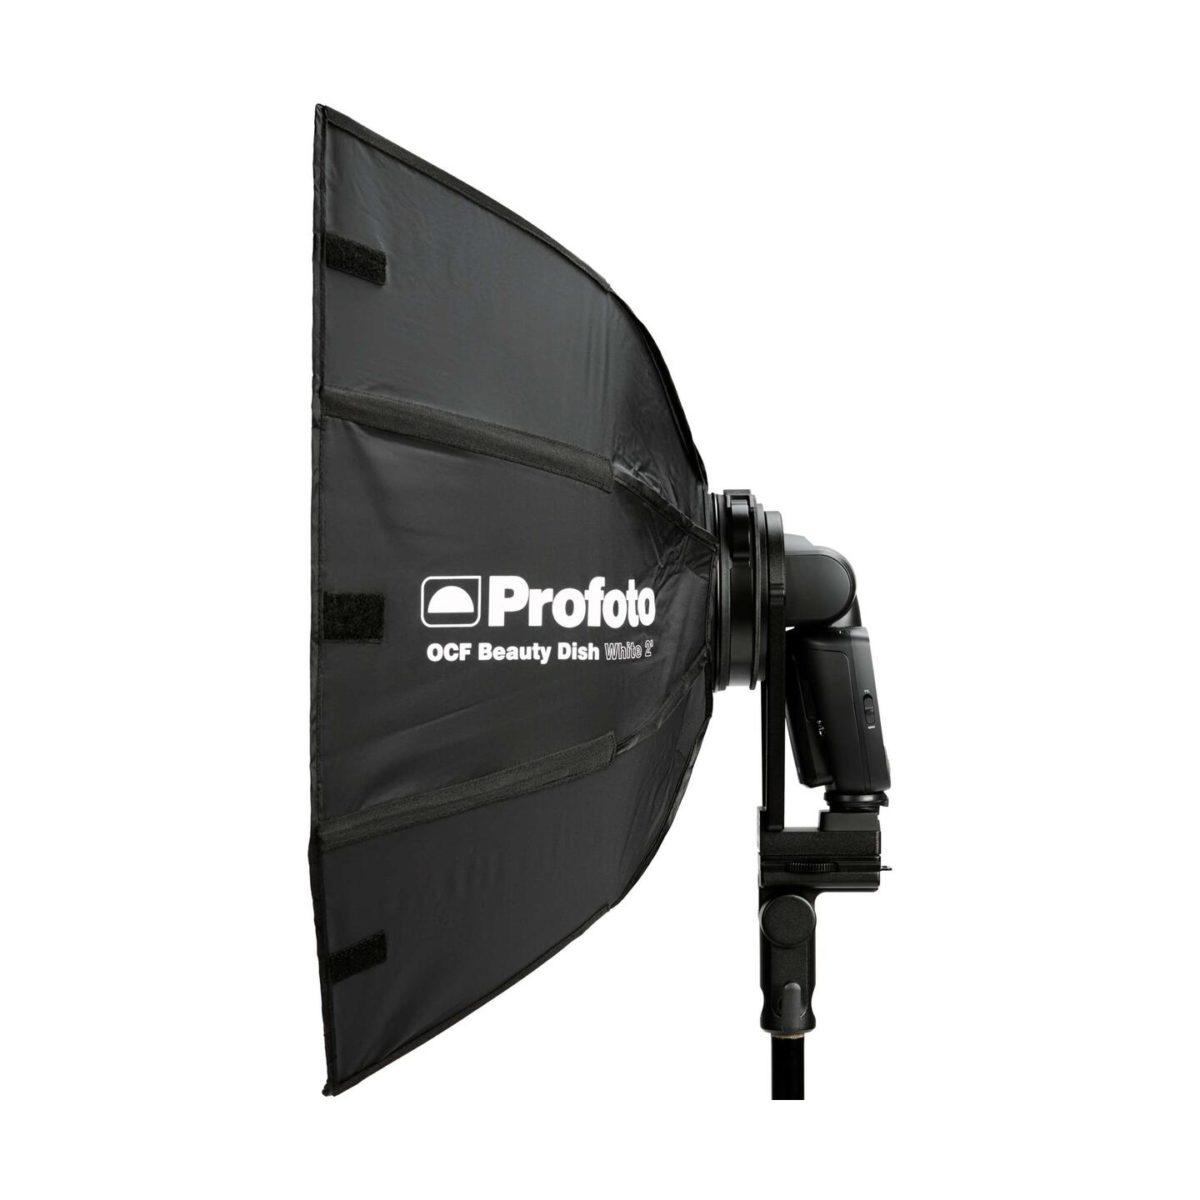 profoto_ocf_adapter_08